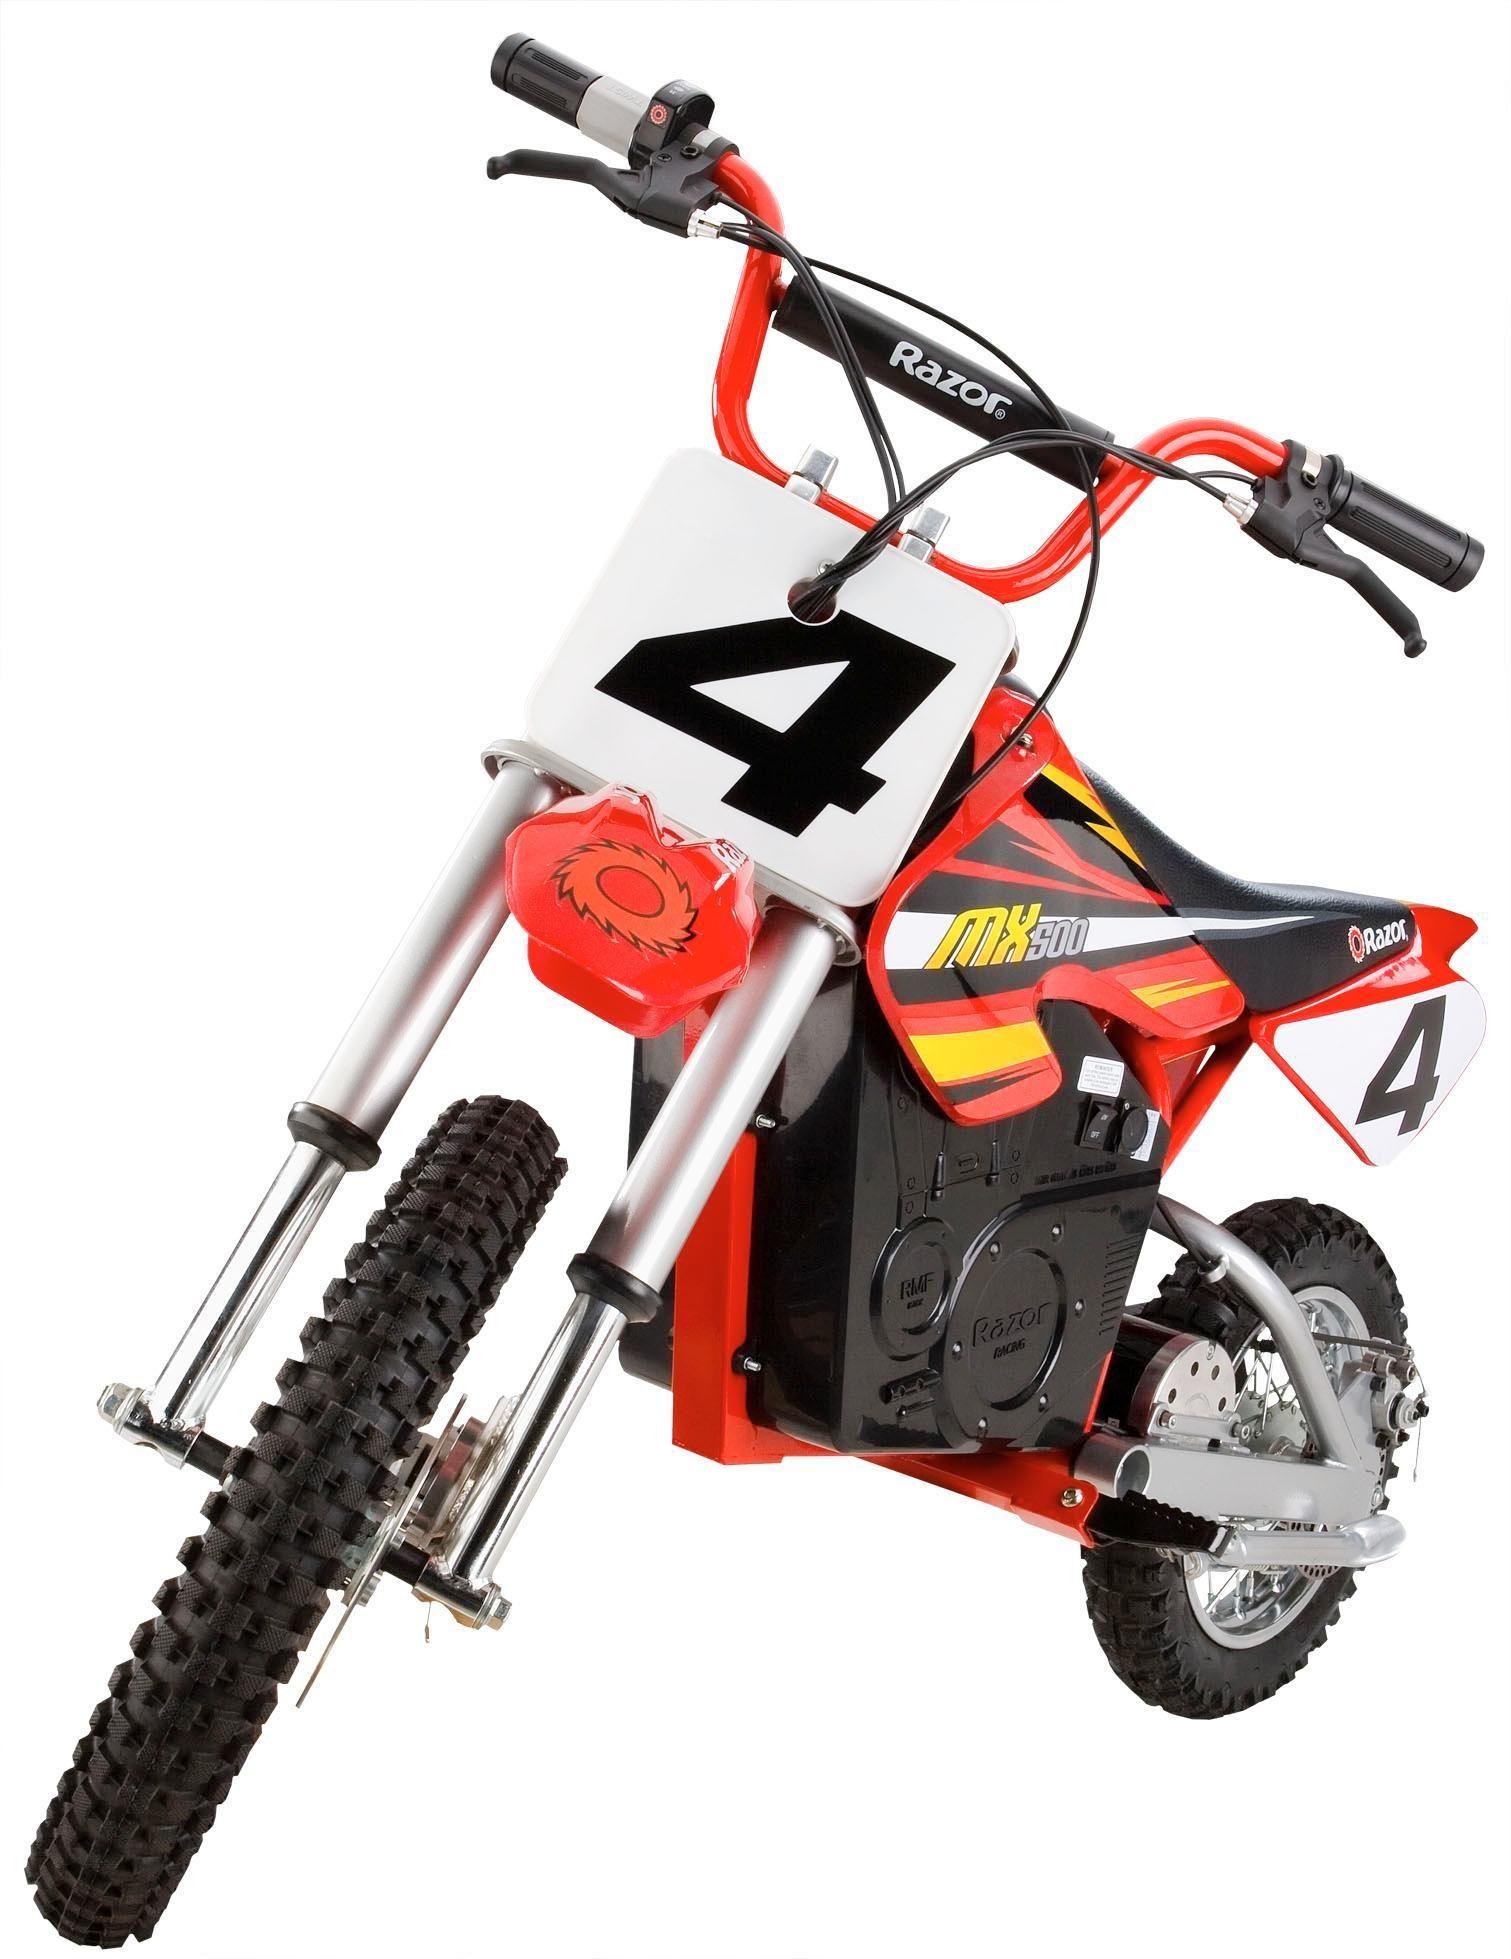 Razor Mx500 Dirt Rocket Electric Motocross Bike Electric Dirt Bike Motocross Bikes Bike